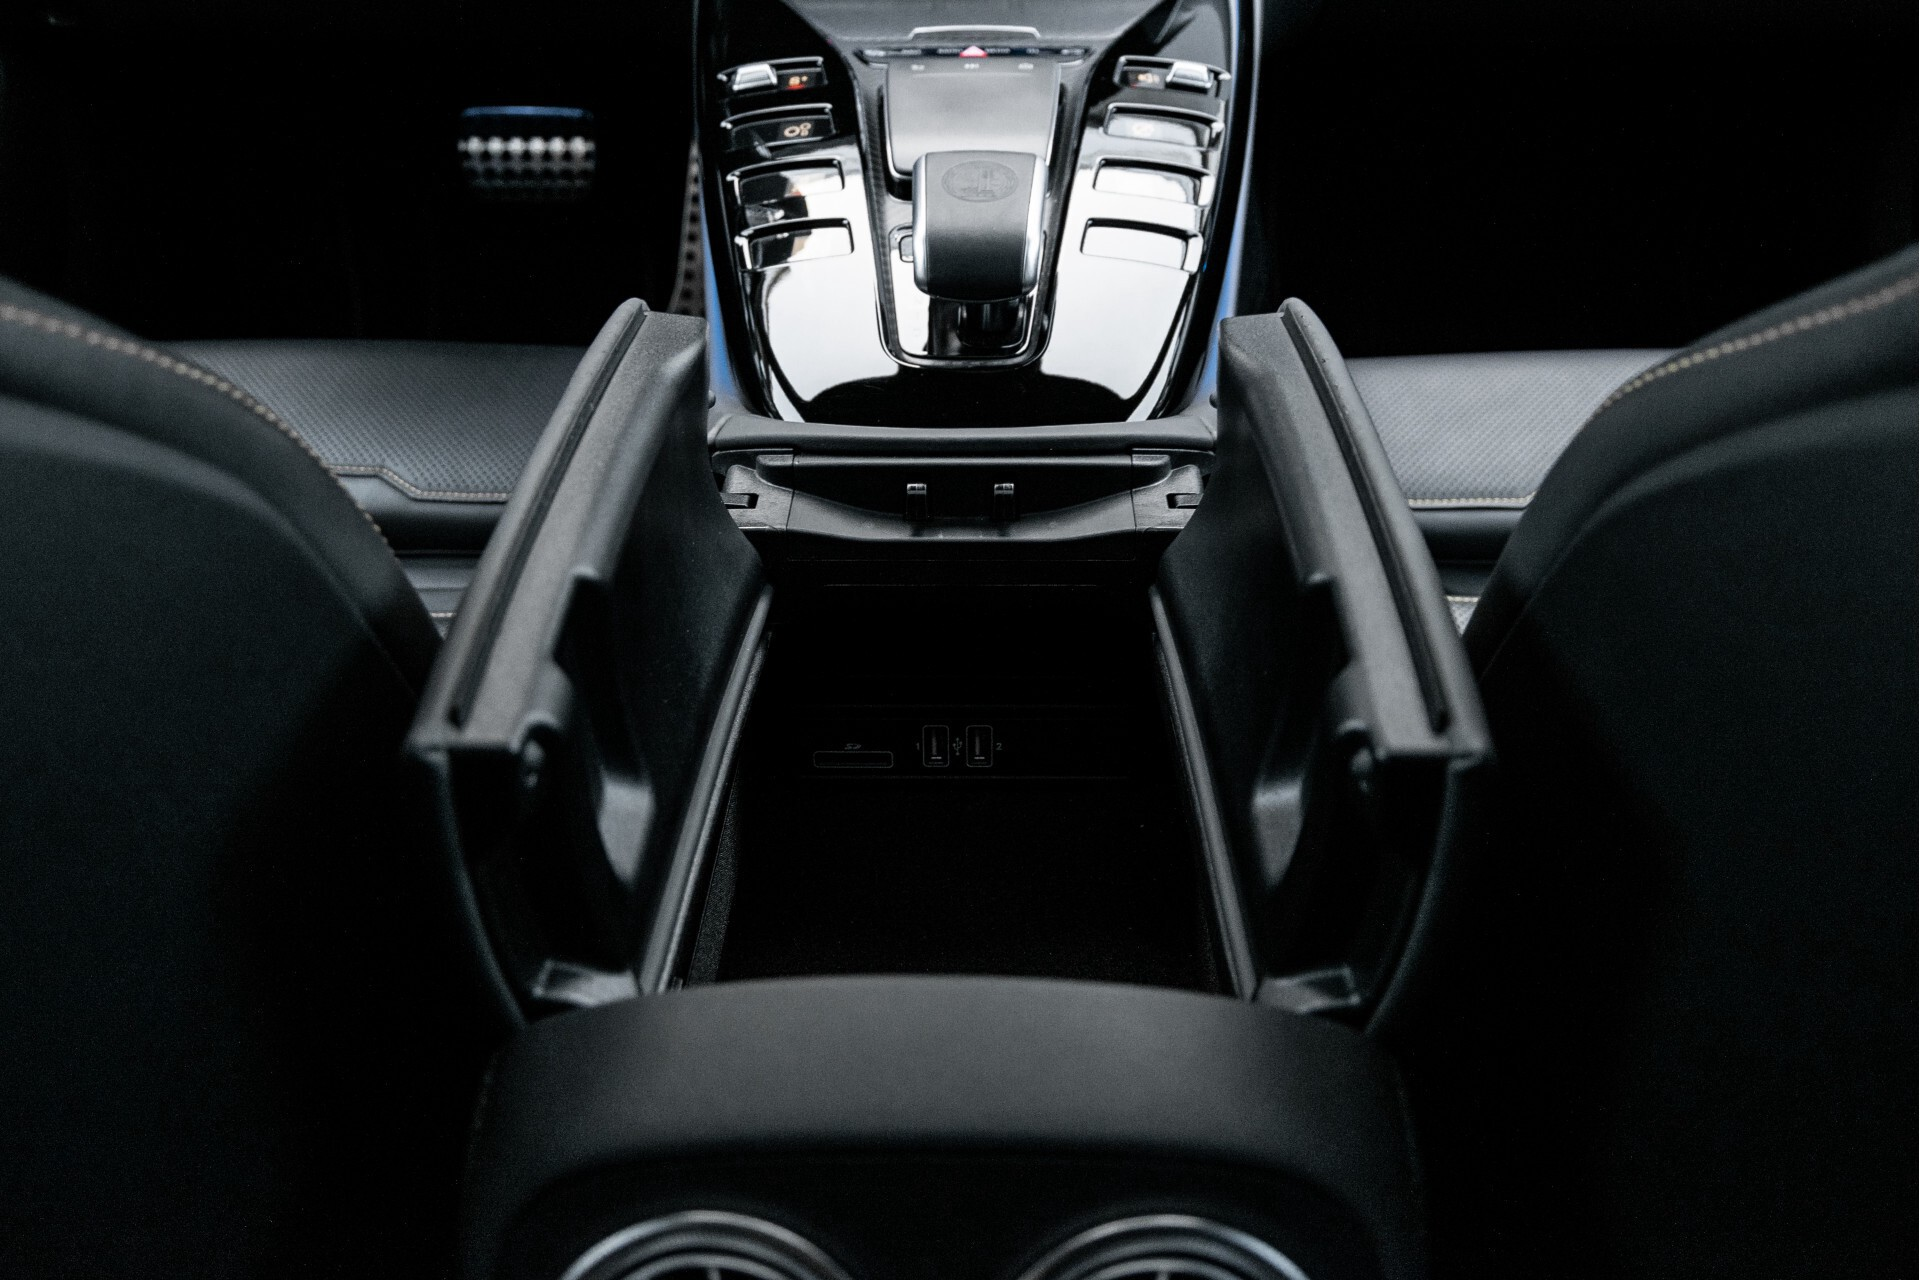 Mercedes-Benz AMG GT 4-Door Coupe 63 S 4MATIC+ Edition 1 Keramisch/Carbon/First Class/Dynamic Plus/Burmester High End 3D Aut9 Foto 71